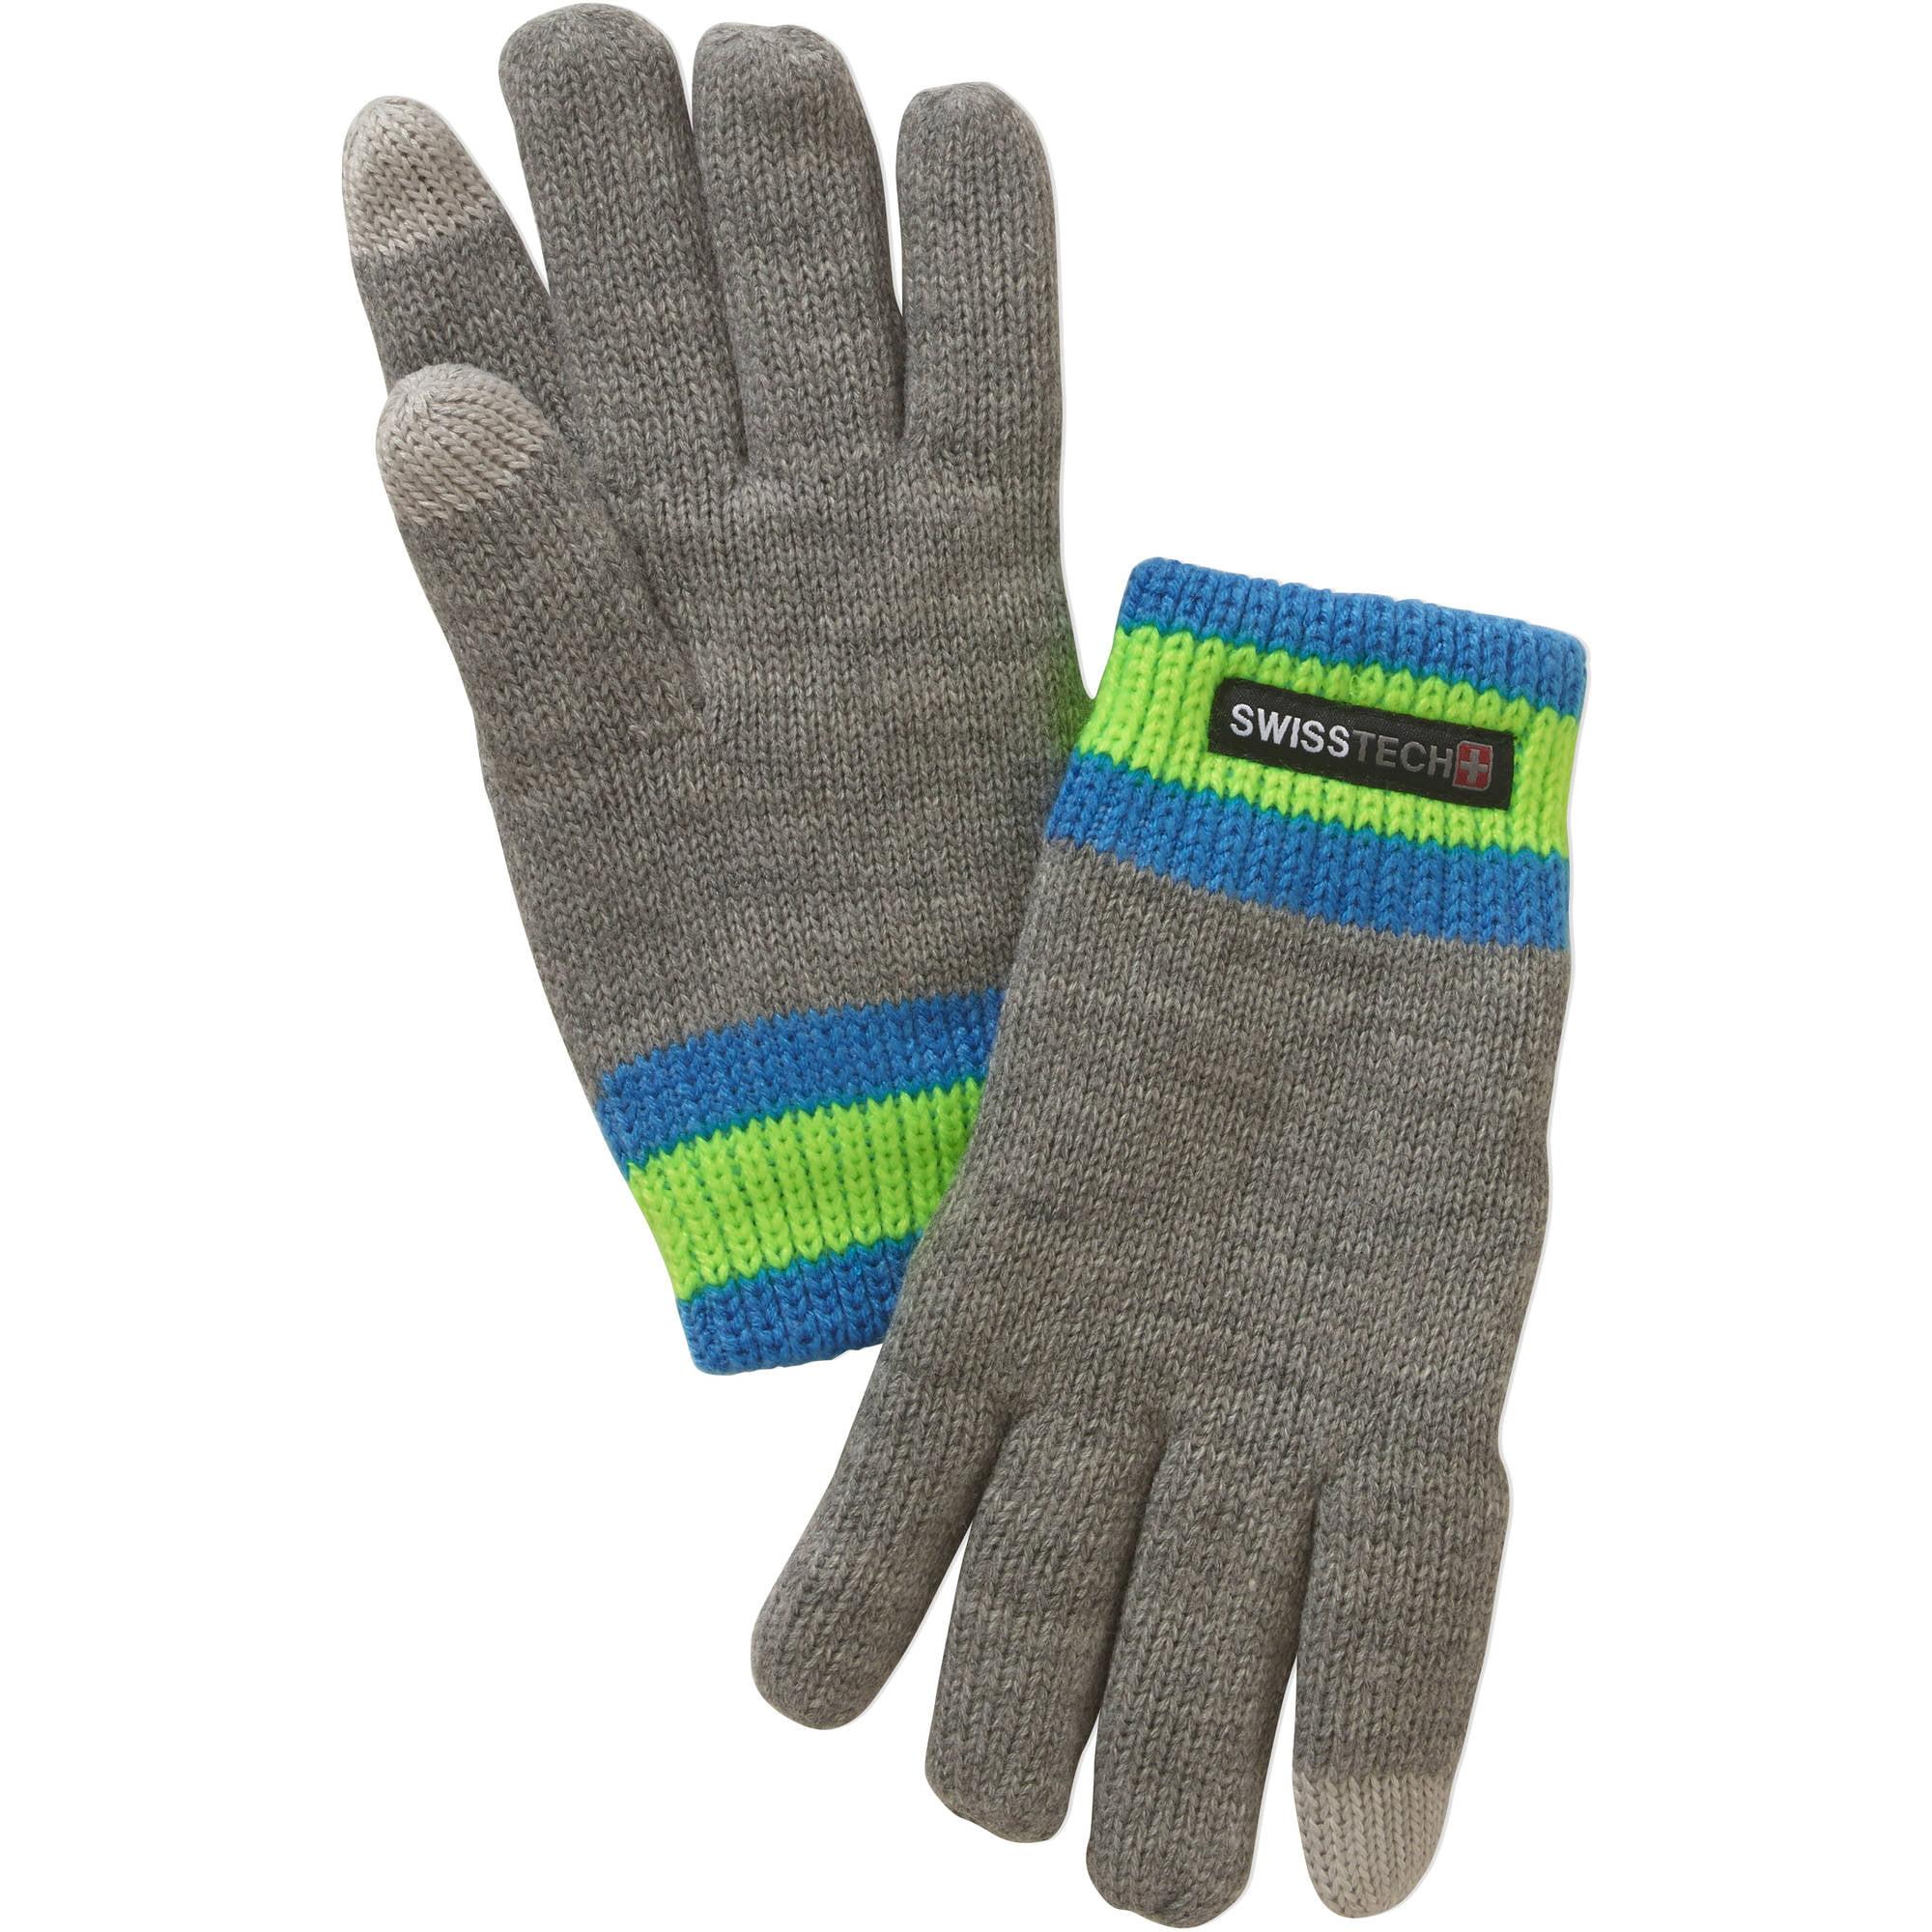 Swiss Tech Boys Knit Glove With Texting